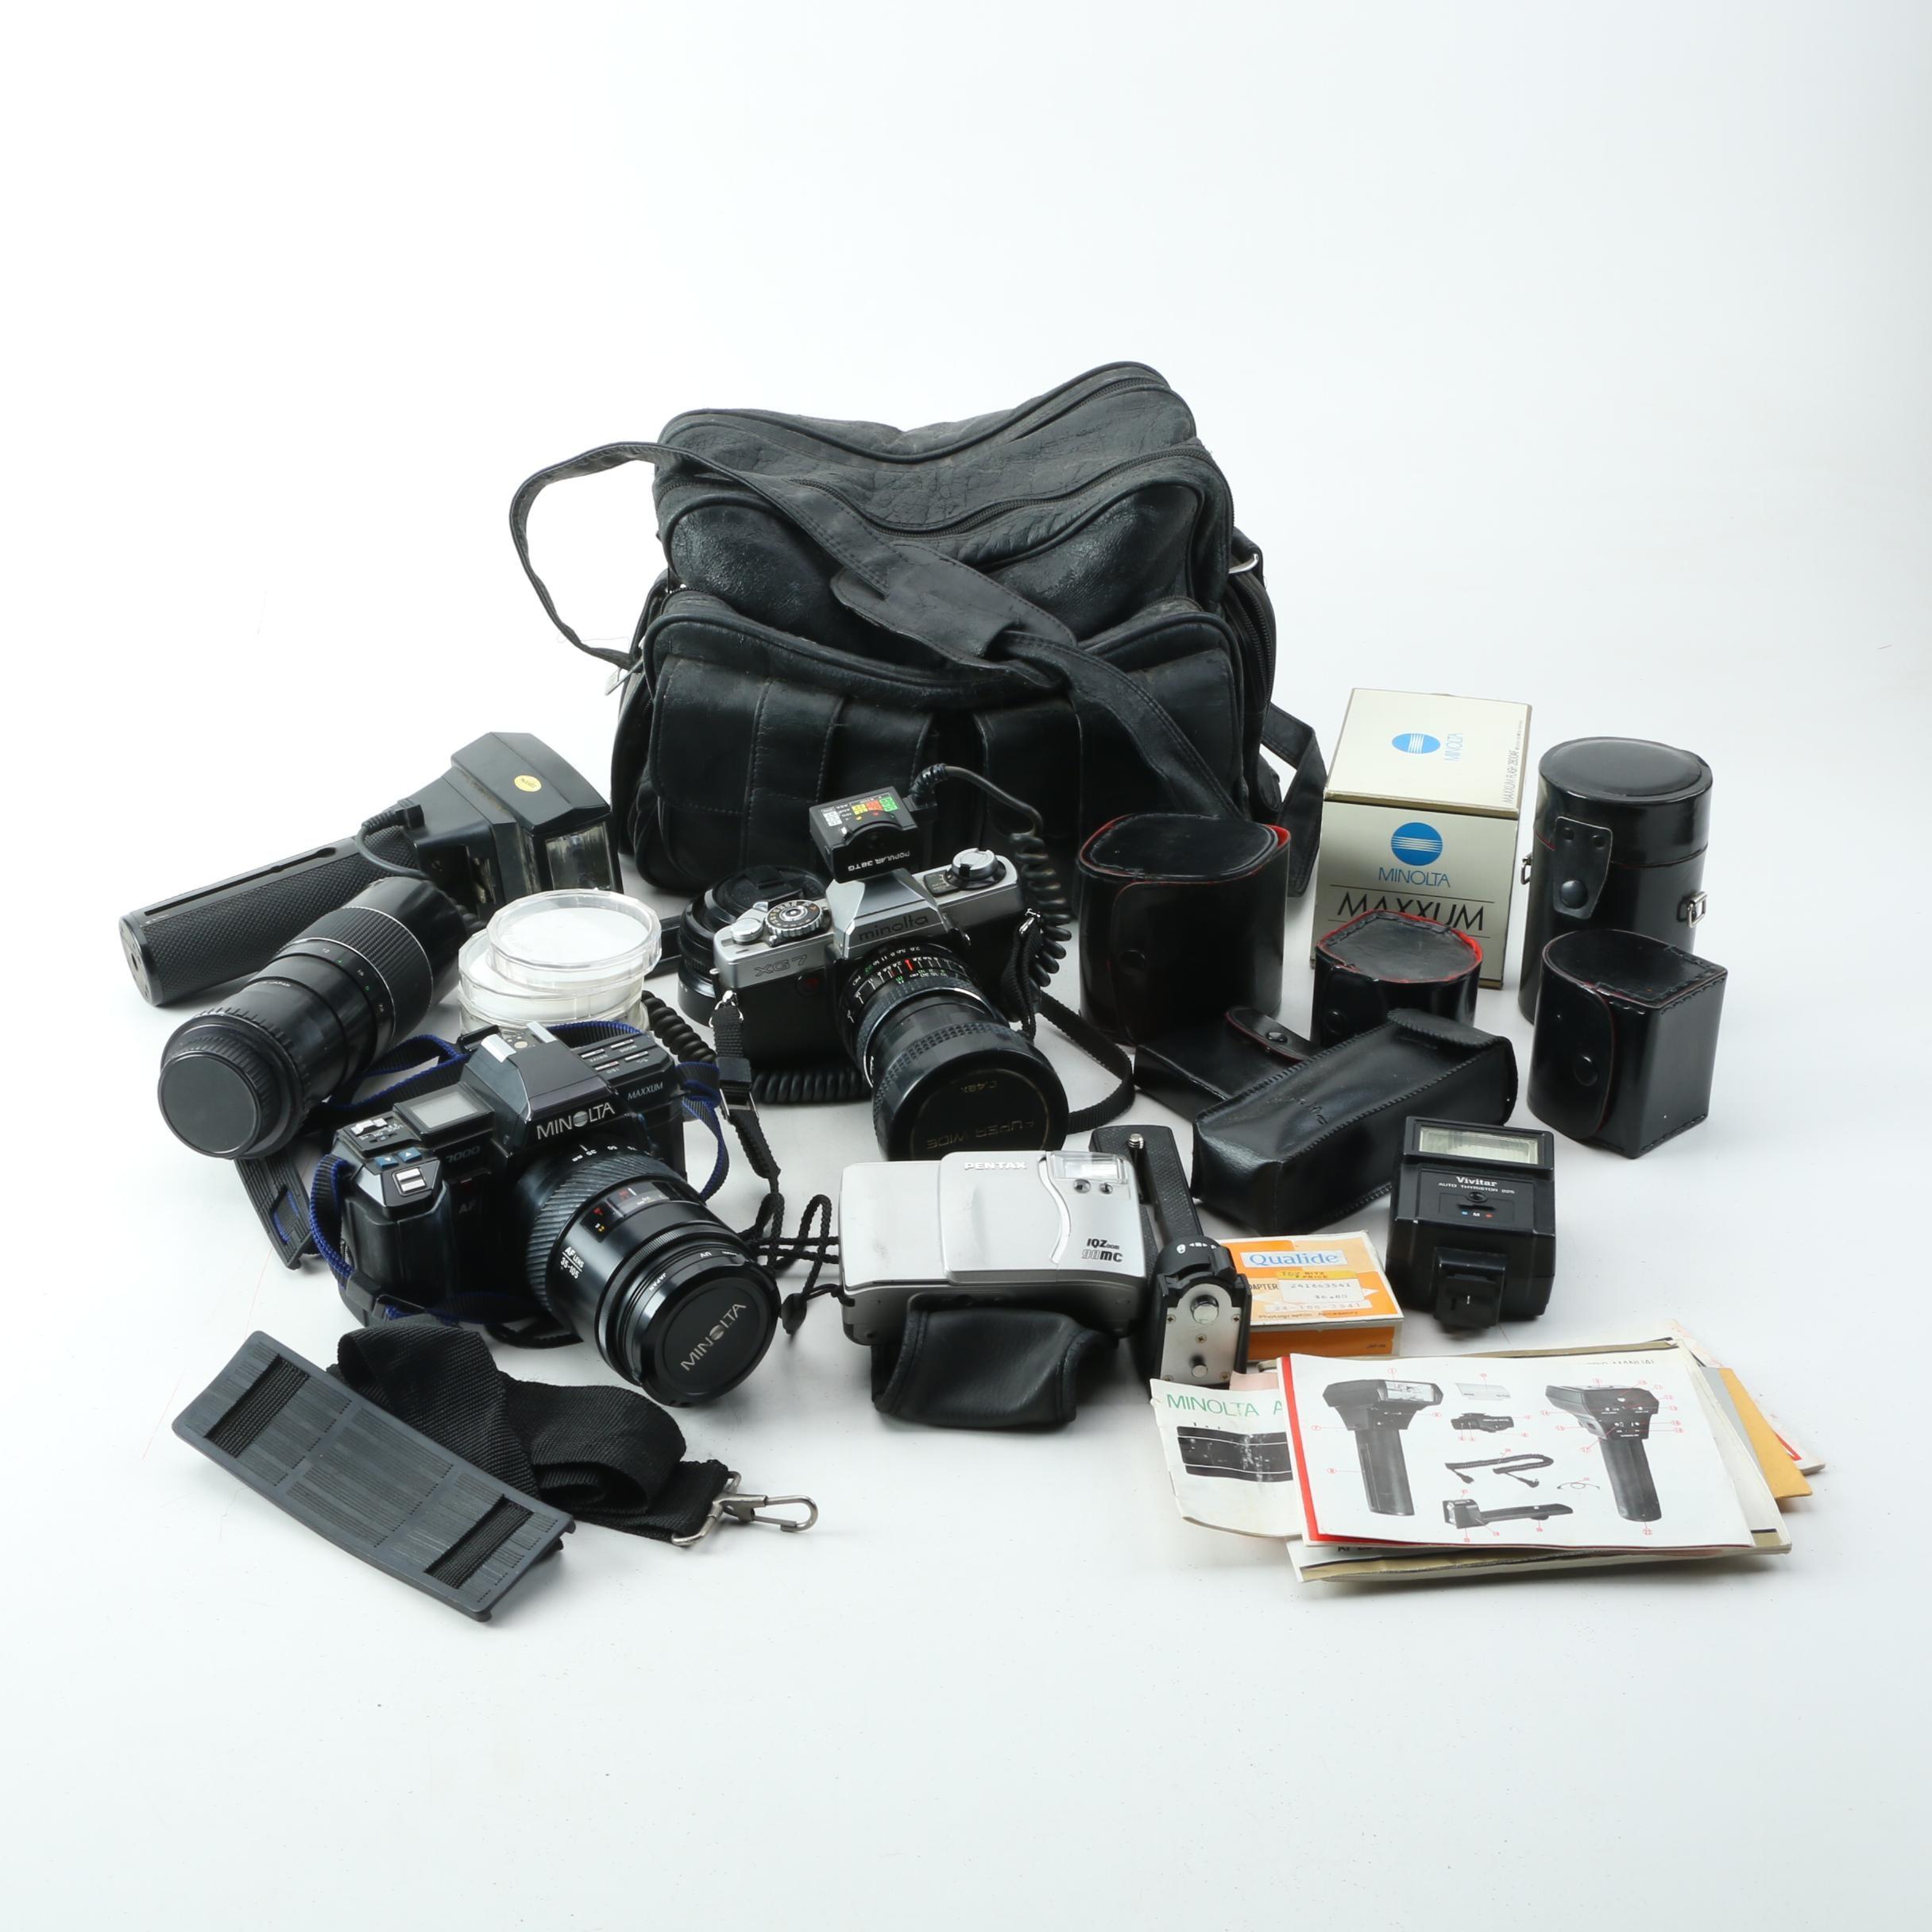 Vintage Minolta 35mm SLR Cameras with Accessories